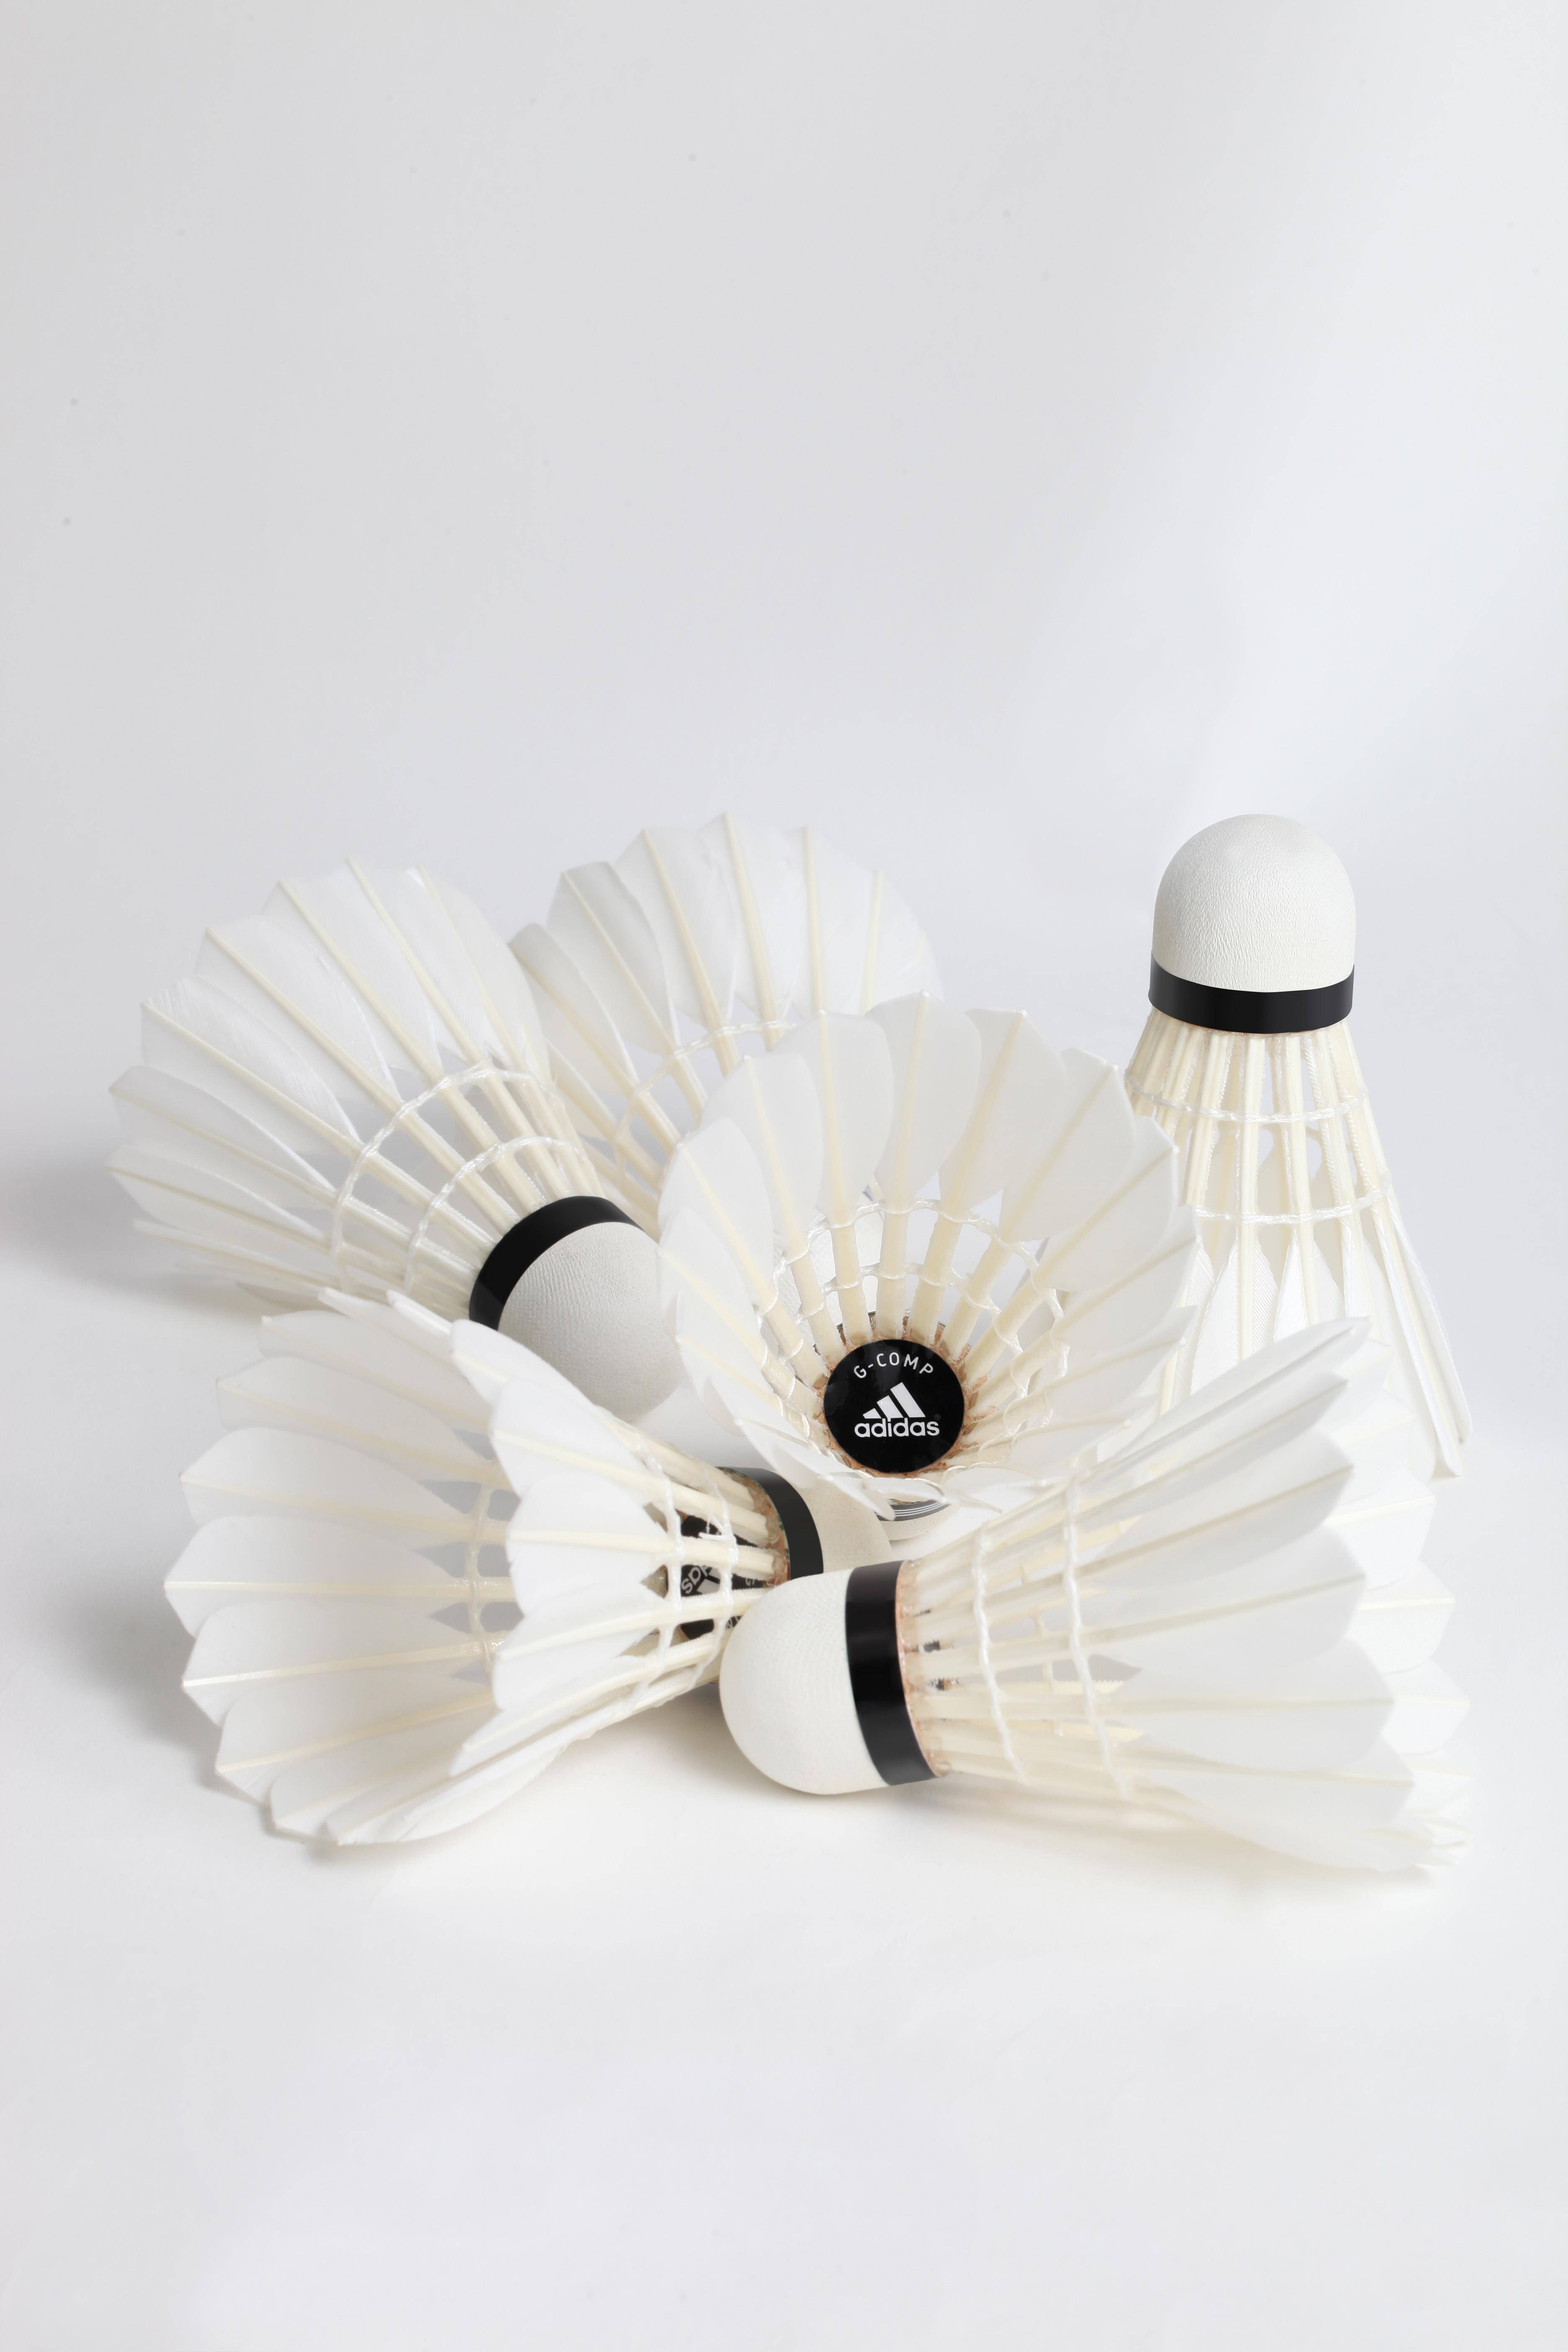 les volants adidas badminton